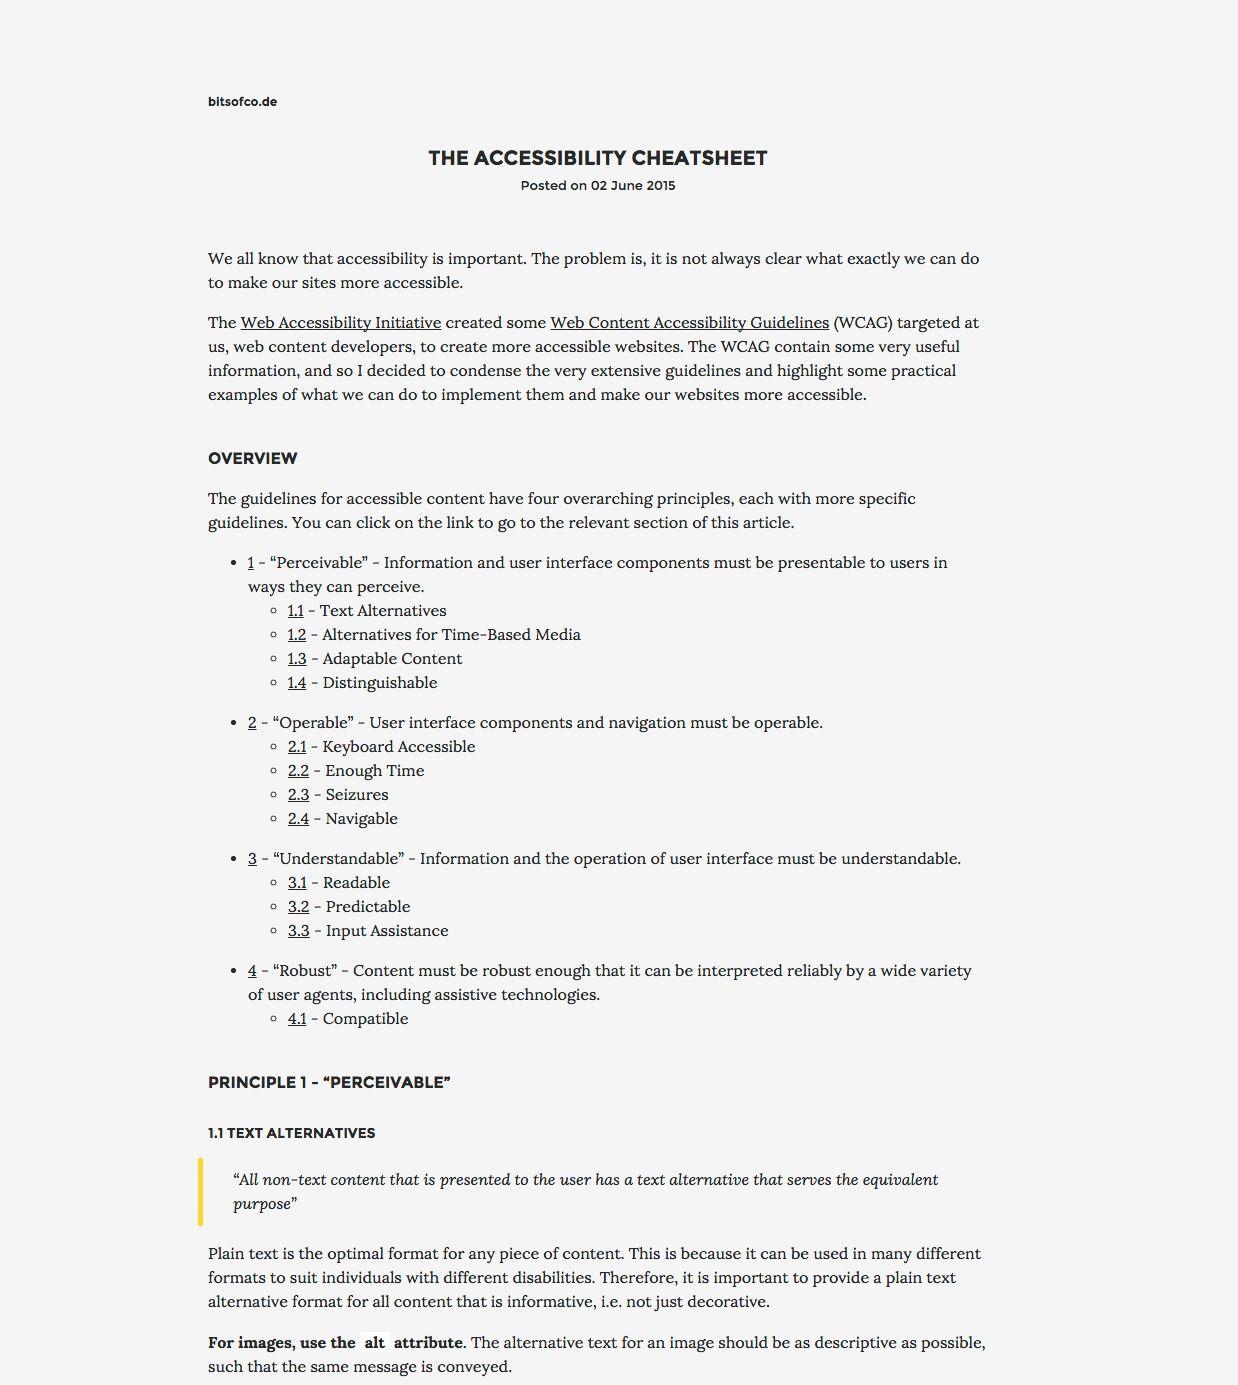 The Accessibility Cheatsheet